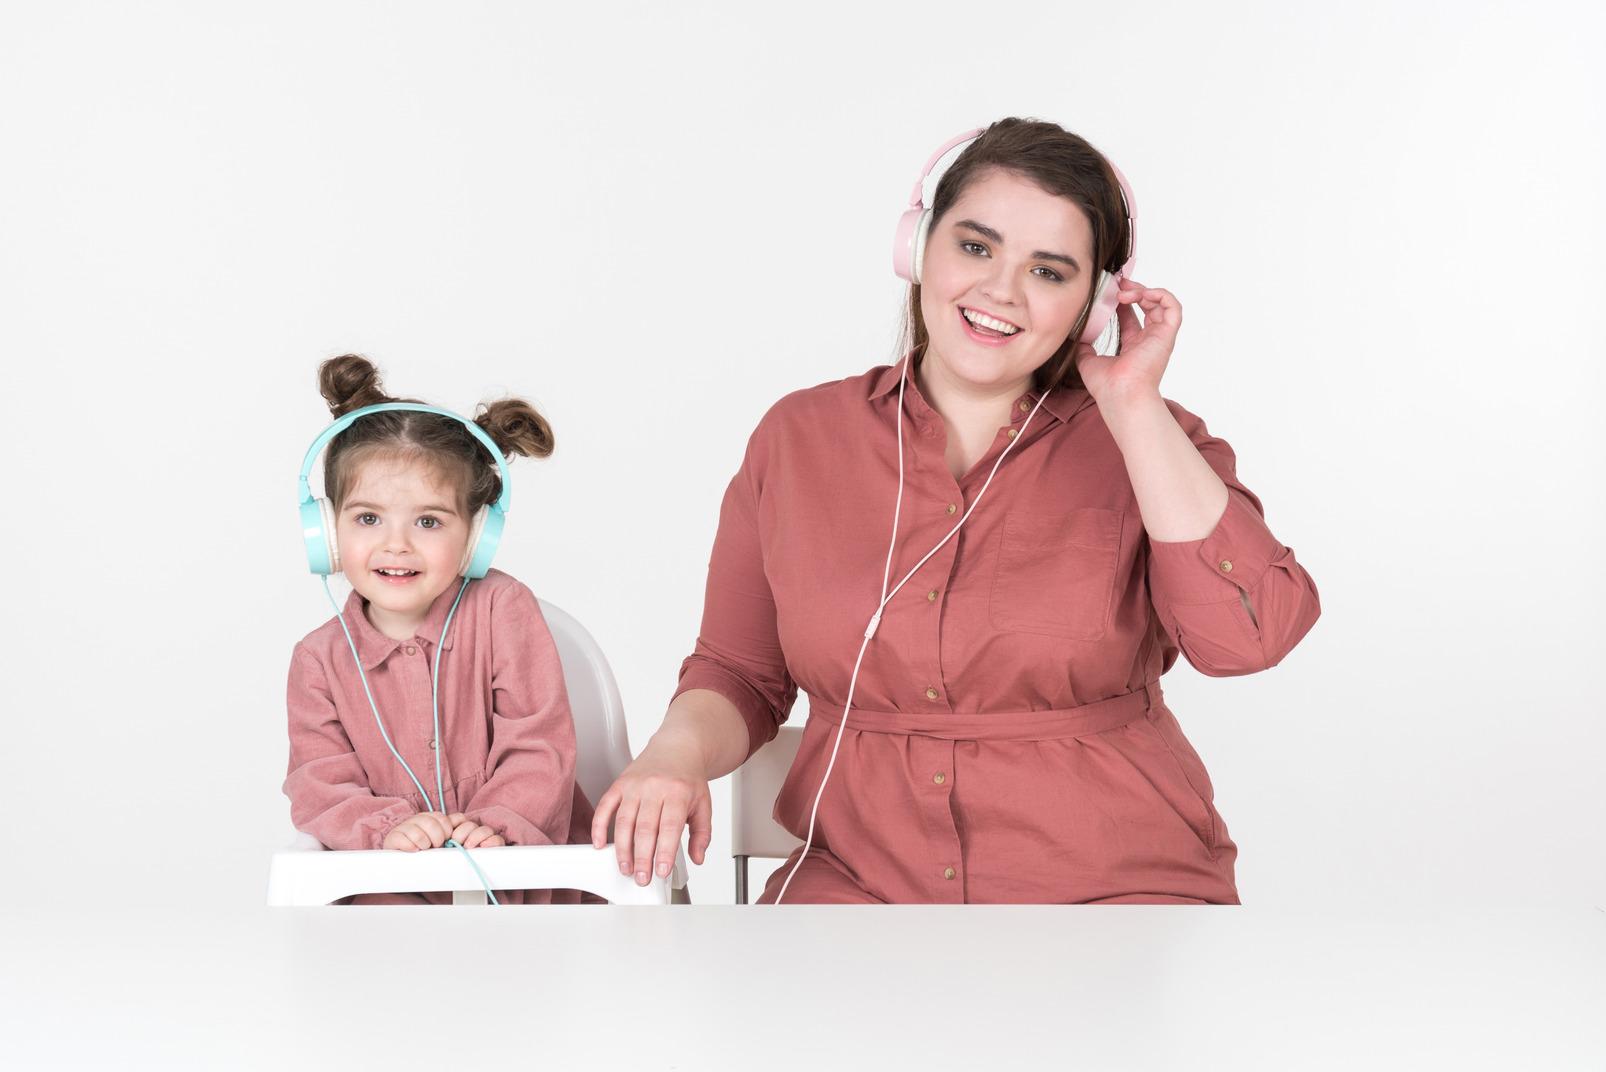 Guter musikgeschmack liegt in der familie